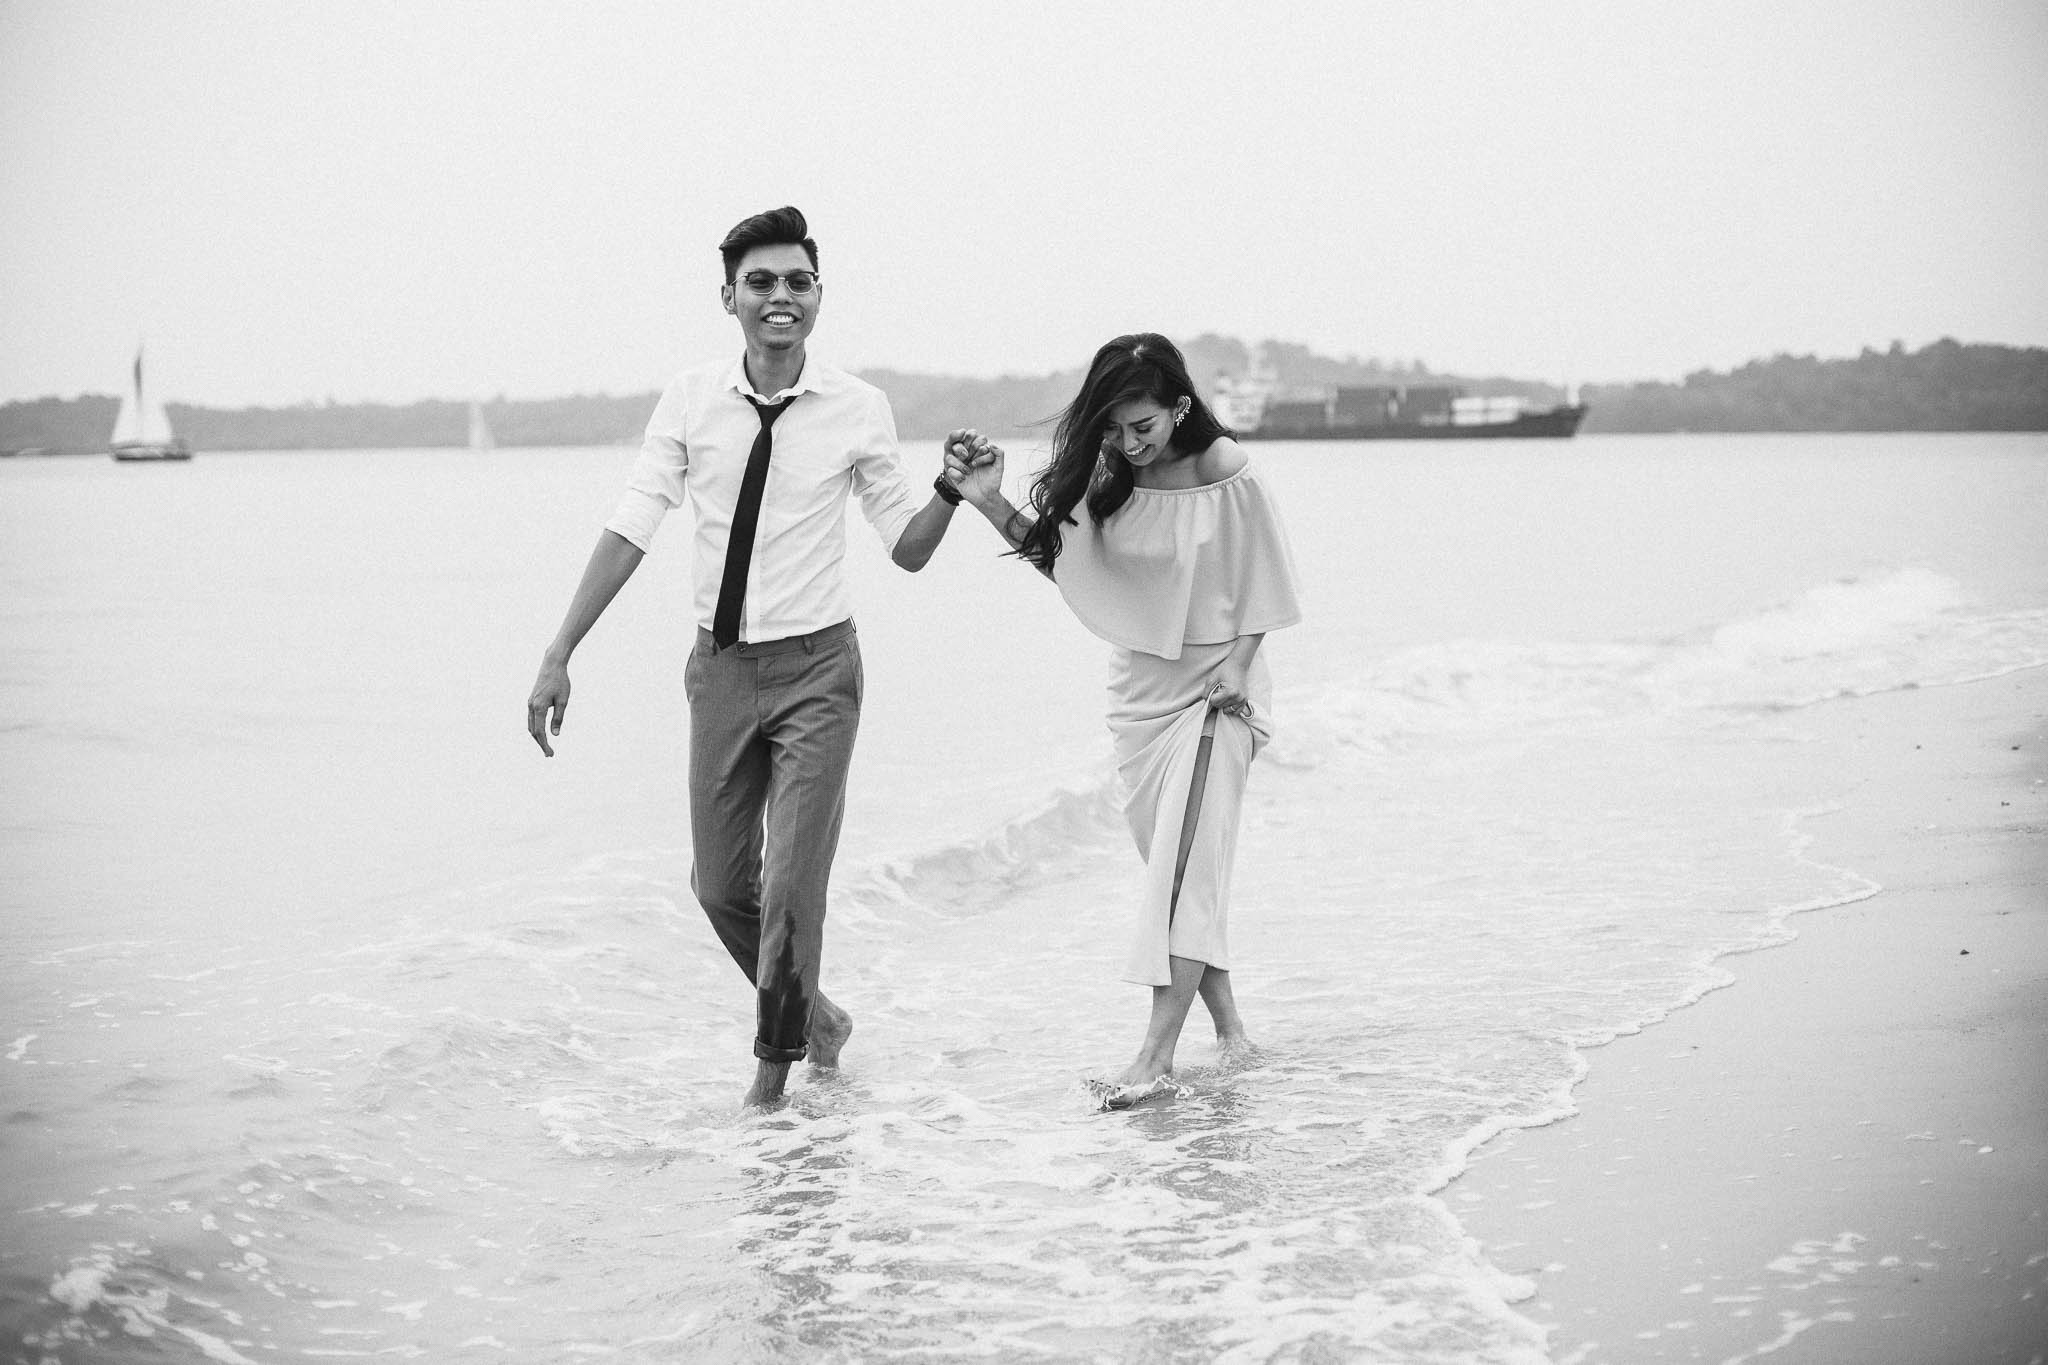 singapore-wedding-photographer-malay-travel-adli-tashah-33.jpg